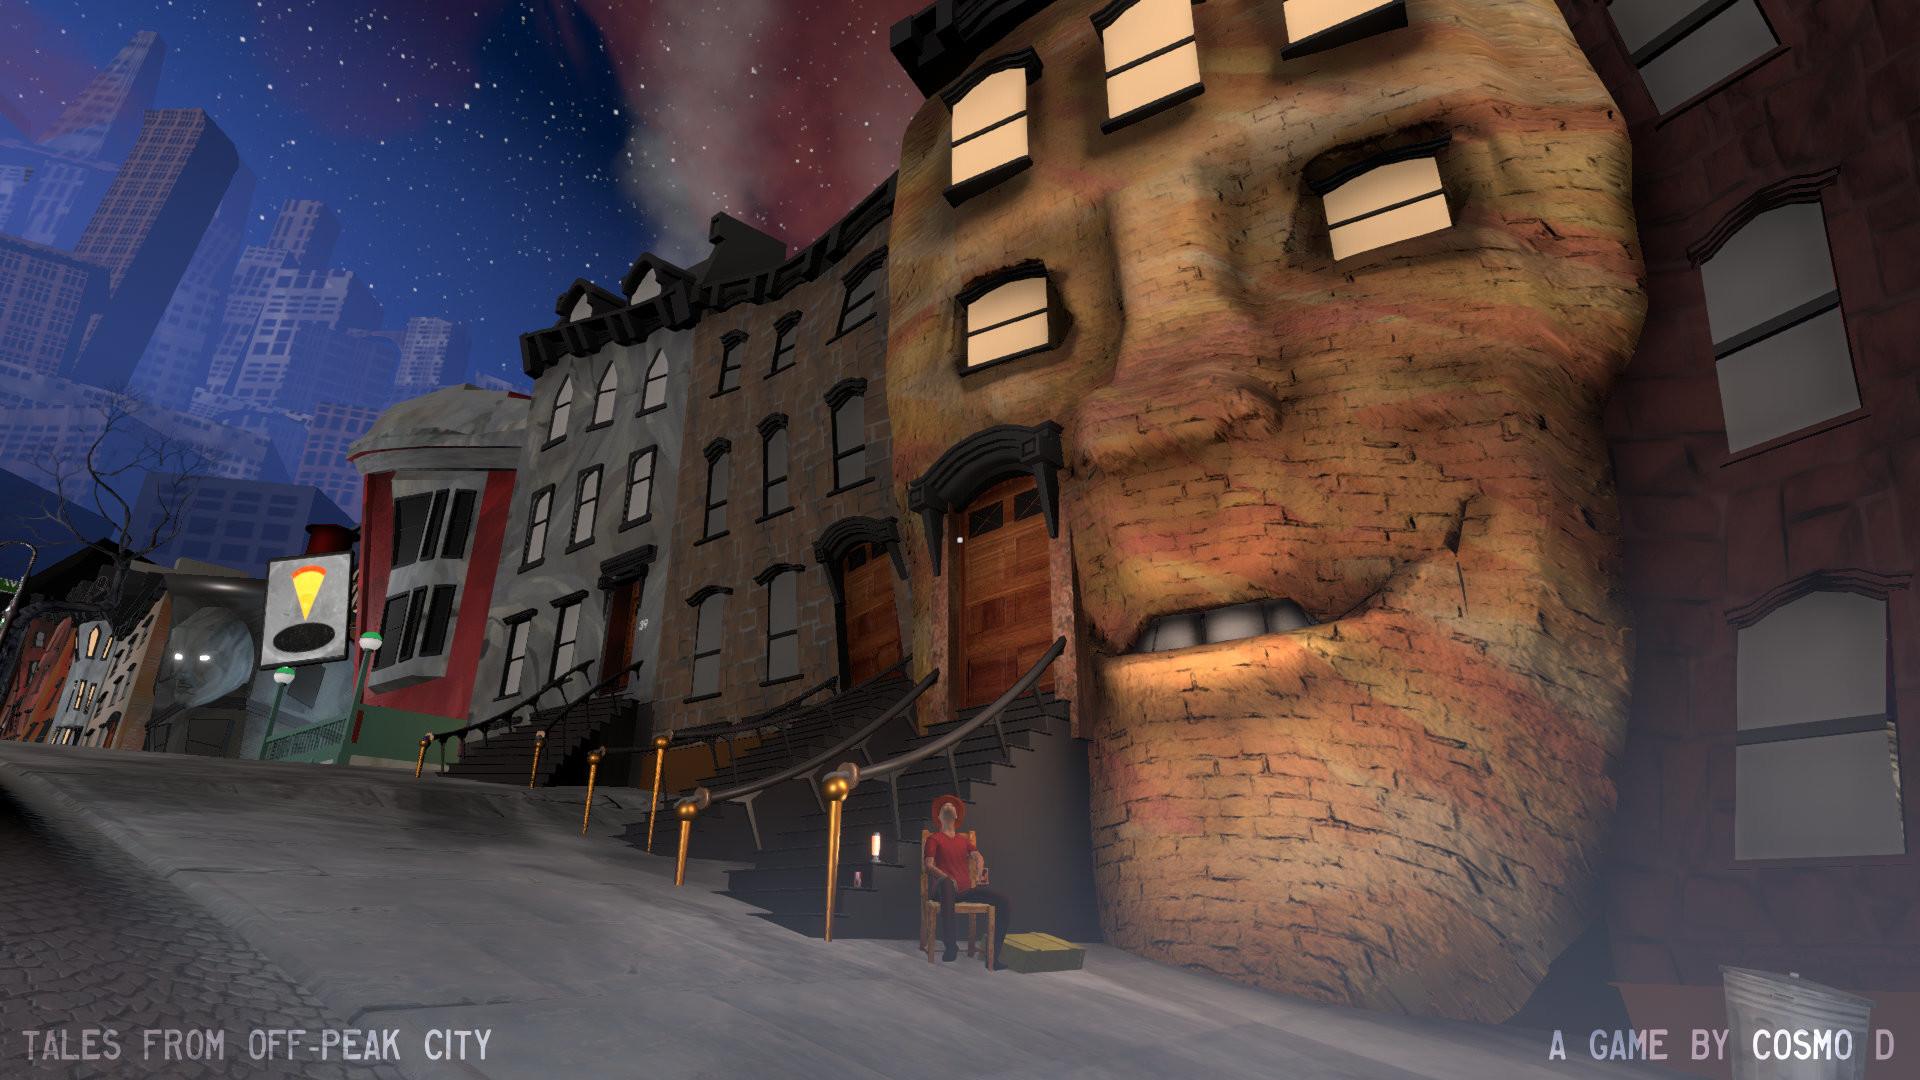 tales-from-off-peak-city-bu-bir-oyun